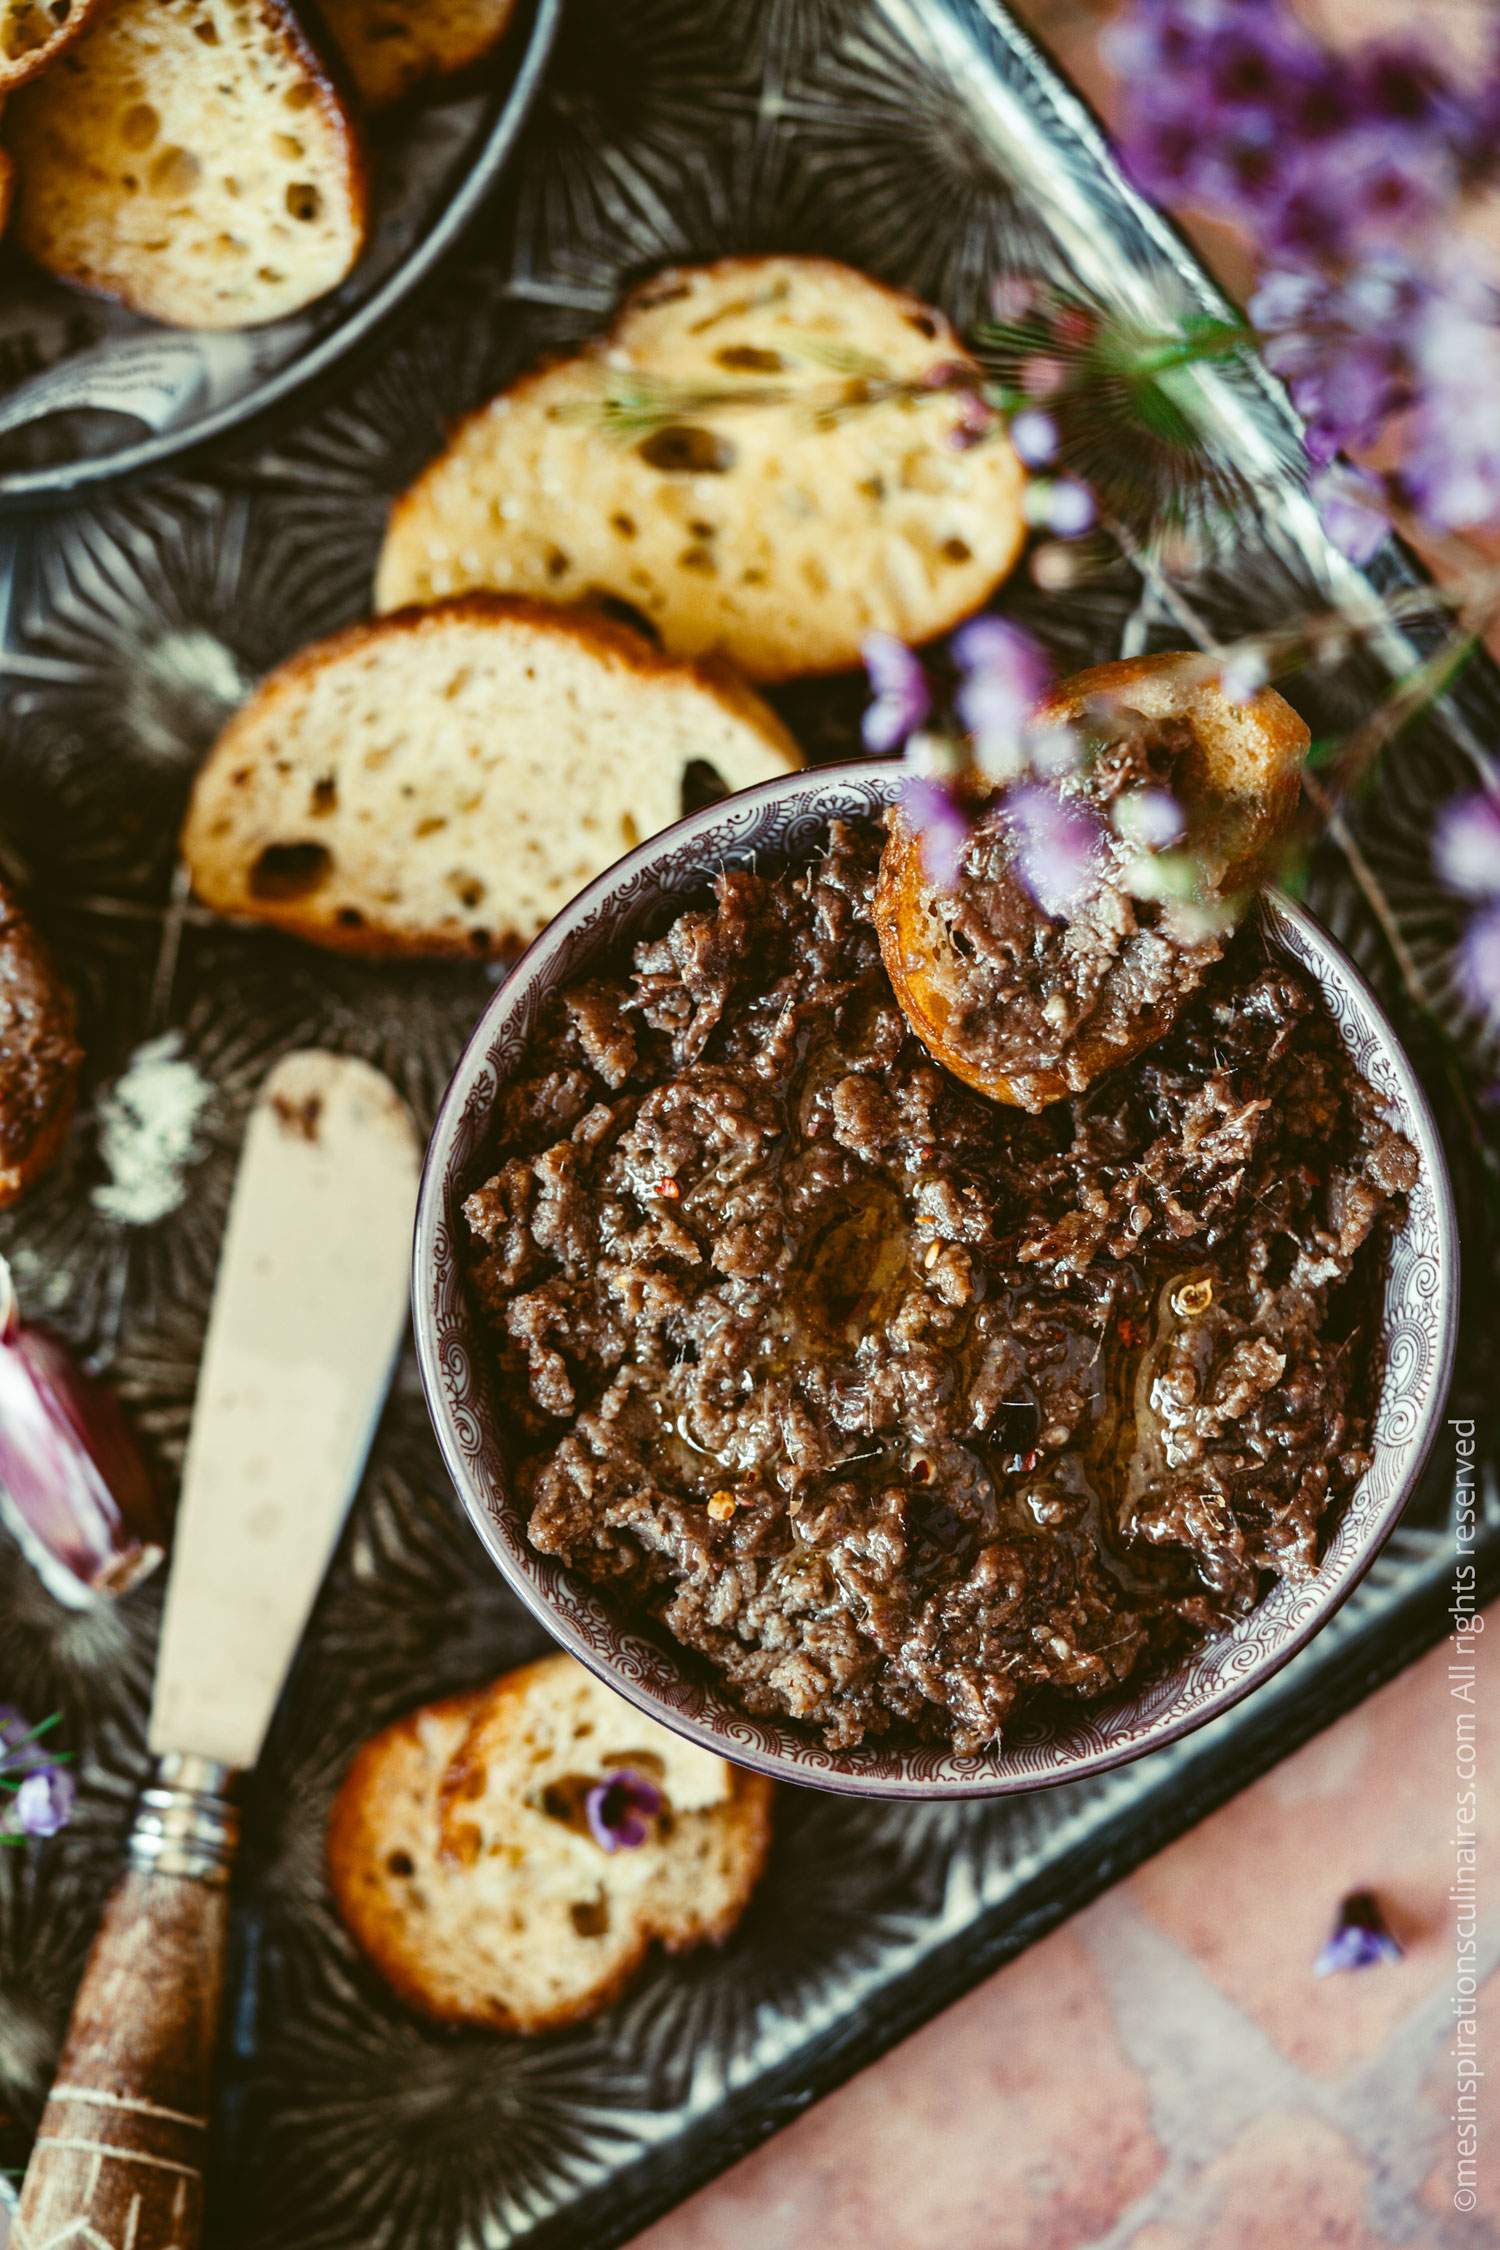 tartinade ou dip aux anchois maison